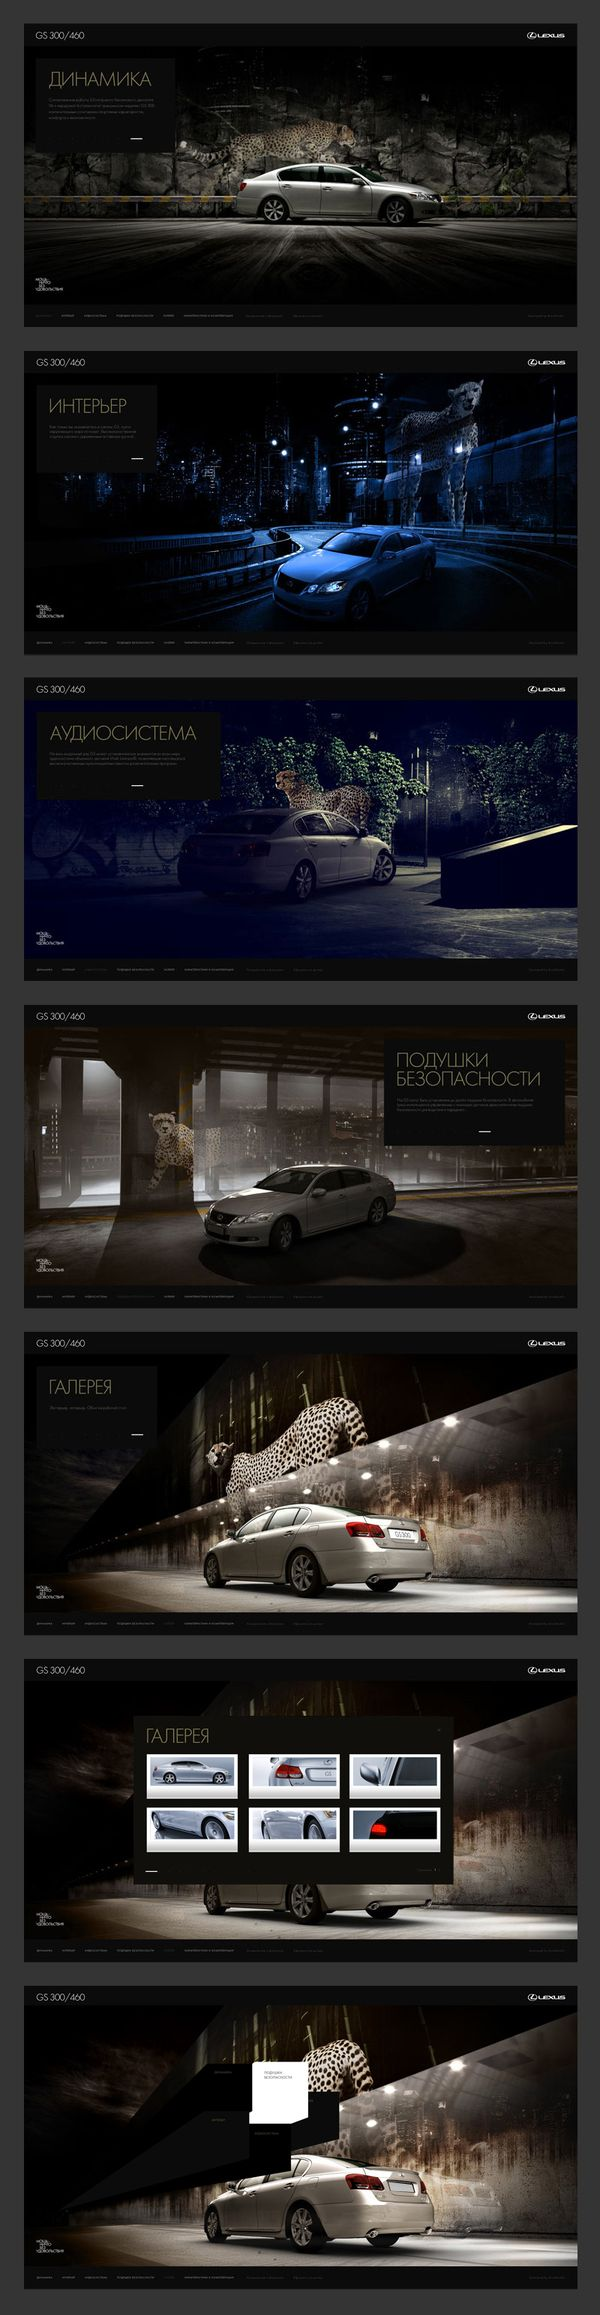 #LexusGS by Alex Kudryavtsev, via #Behance #Webdesign